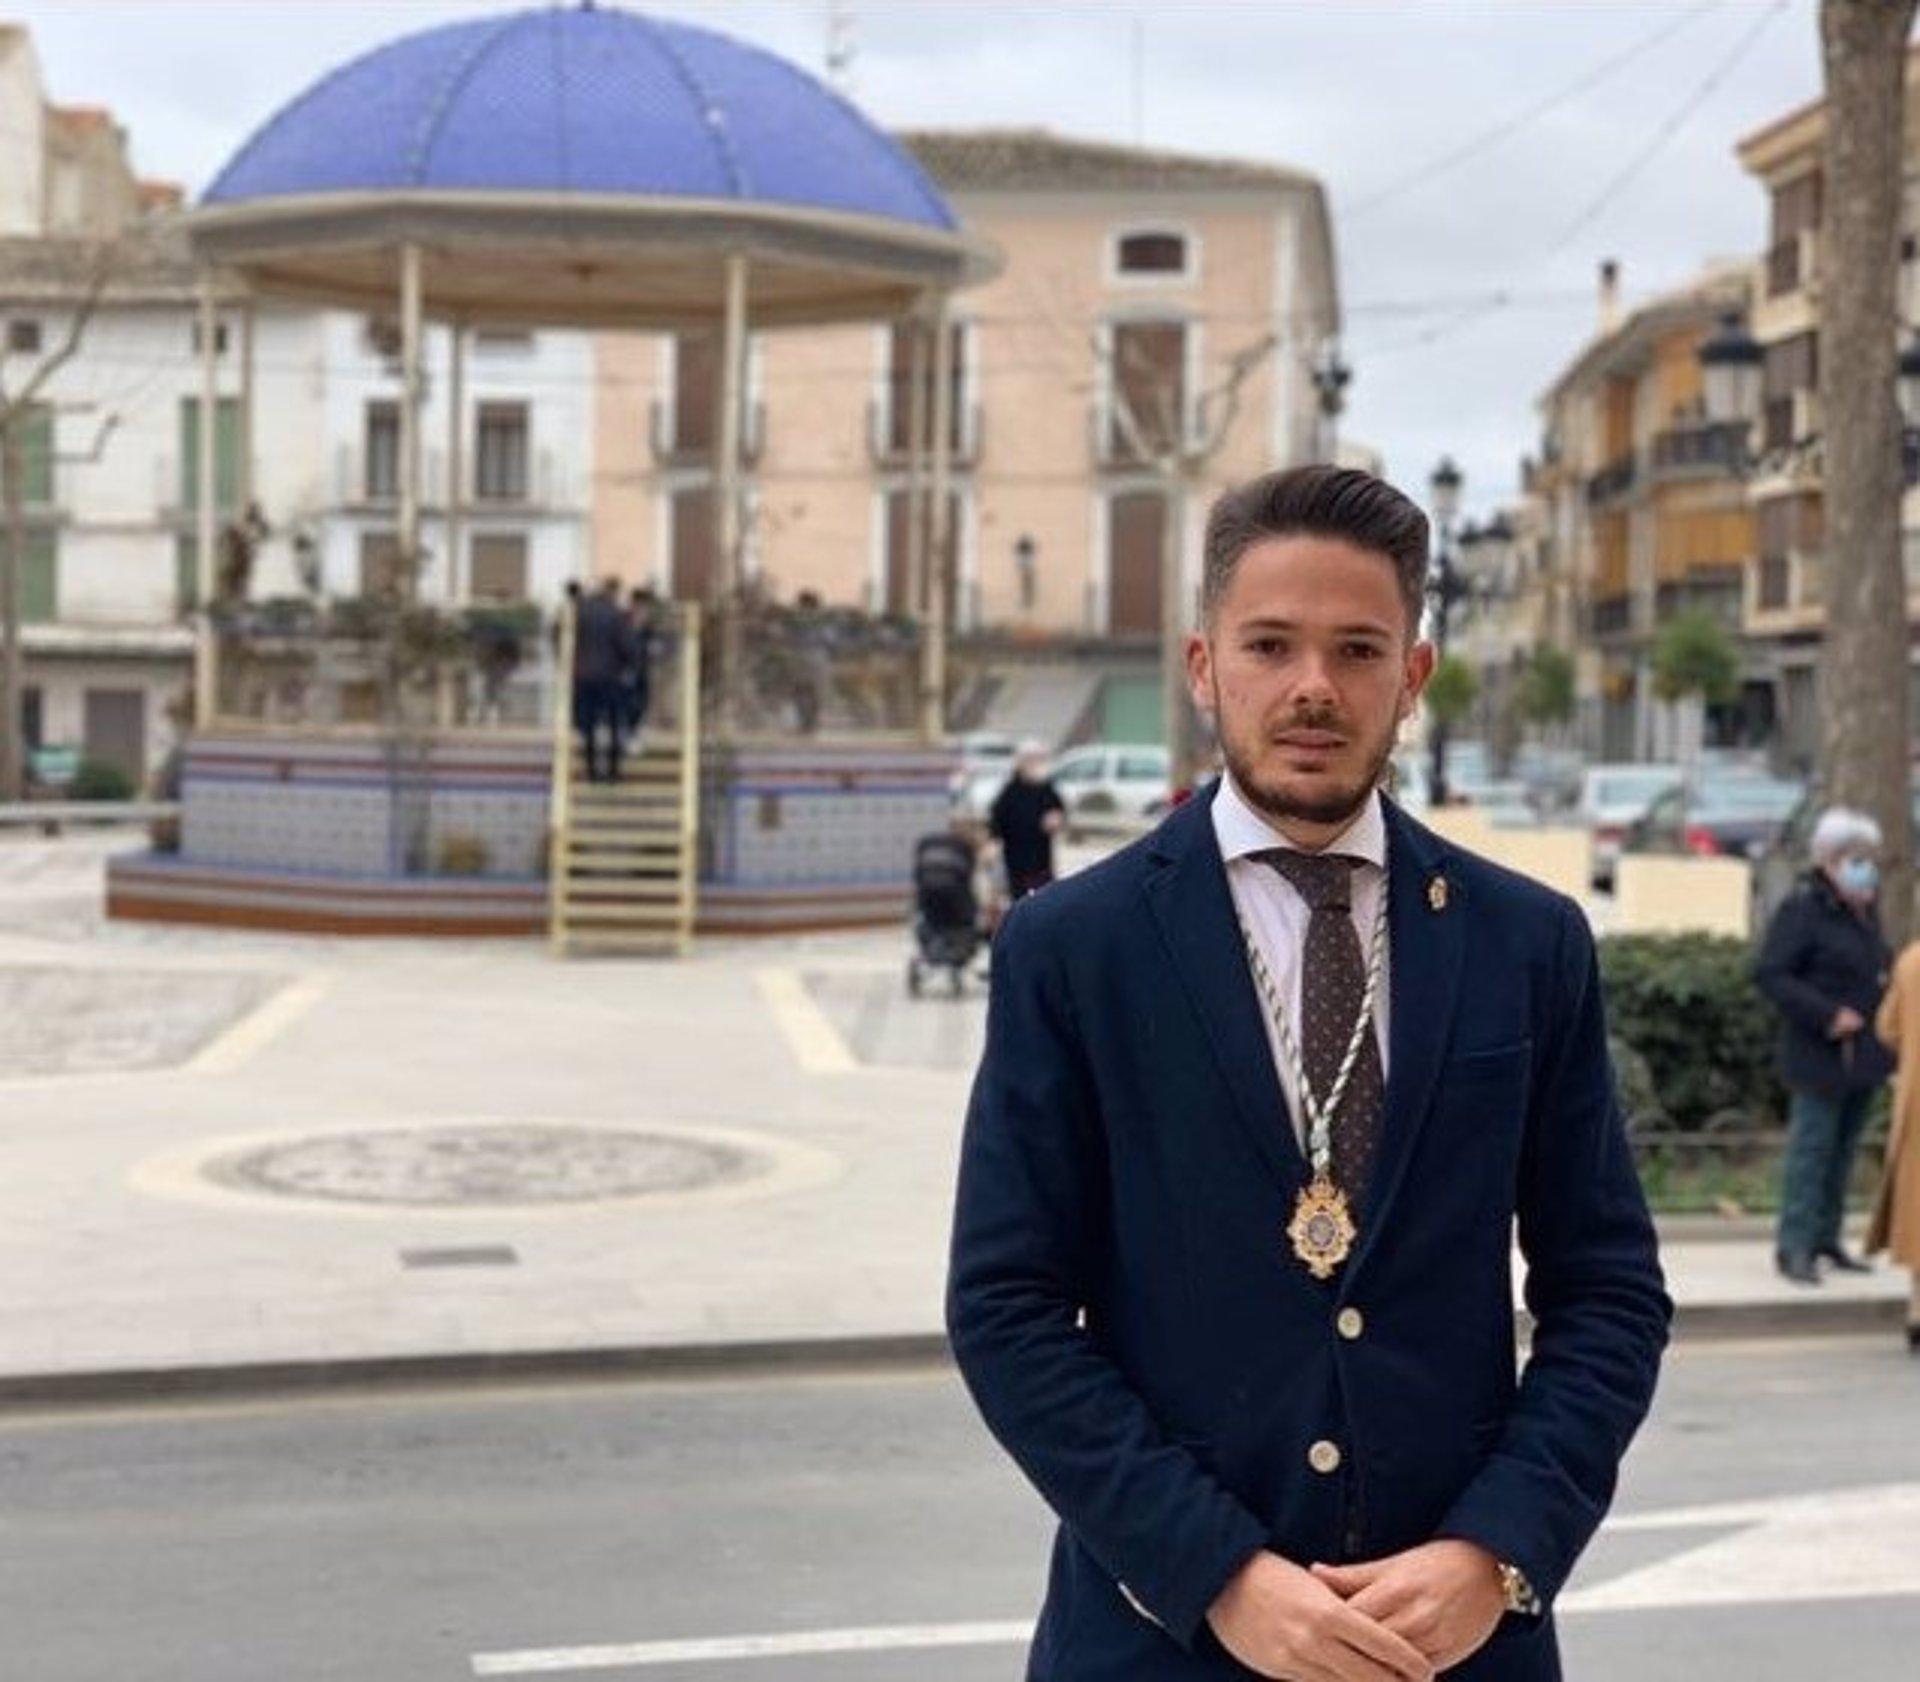 Ramón Martínez (Cs) toma posesión este sábado como alcalde de Huéscar por un pacto de alternancia con el PP